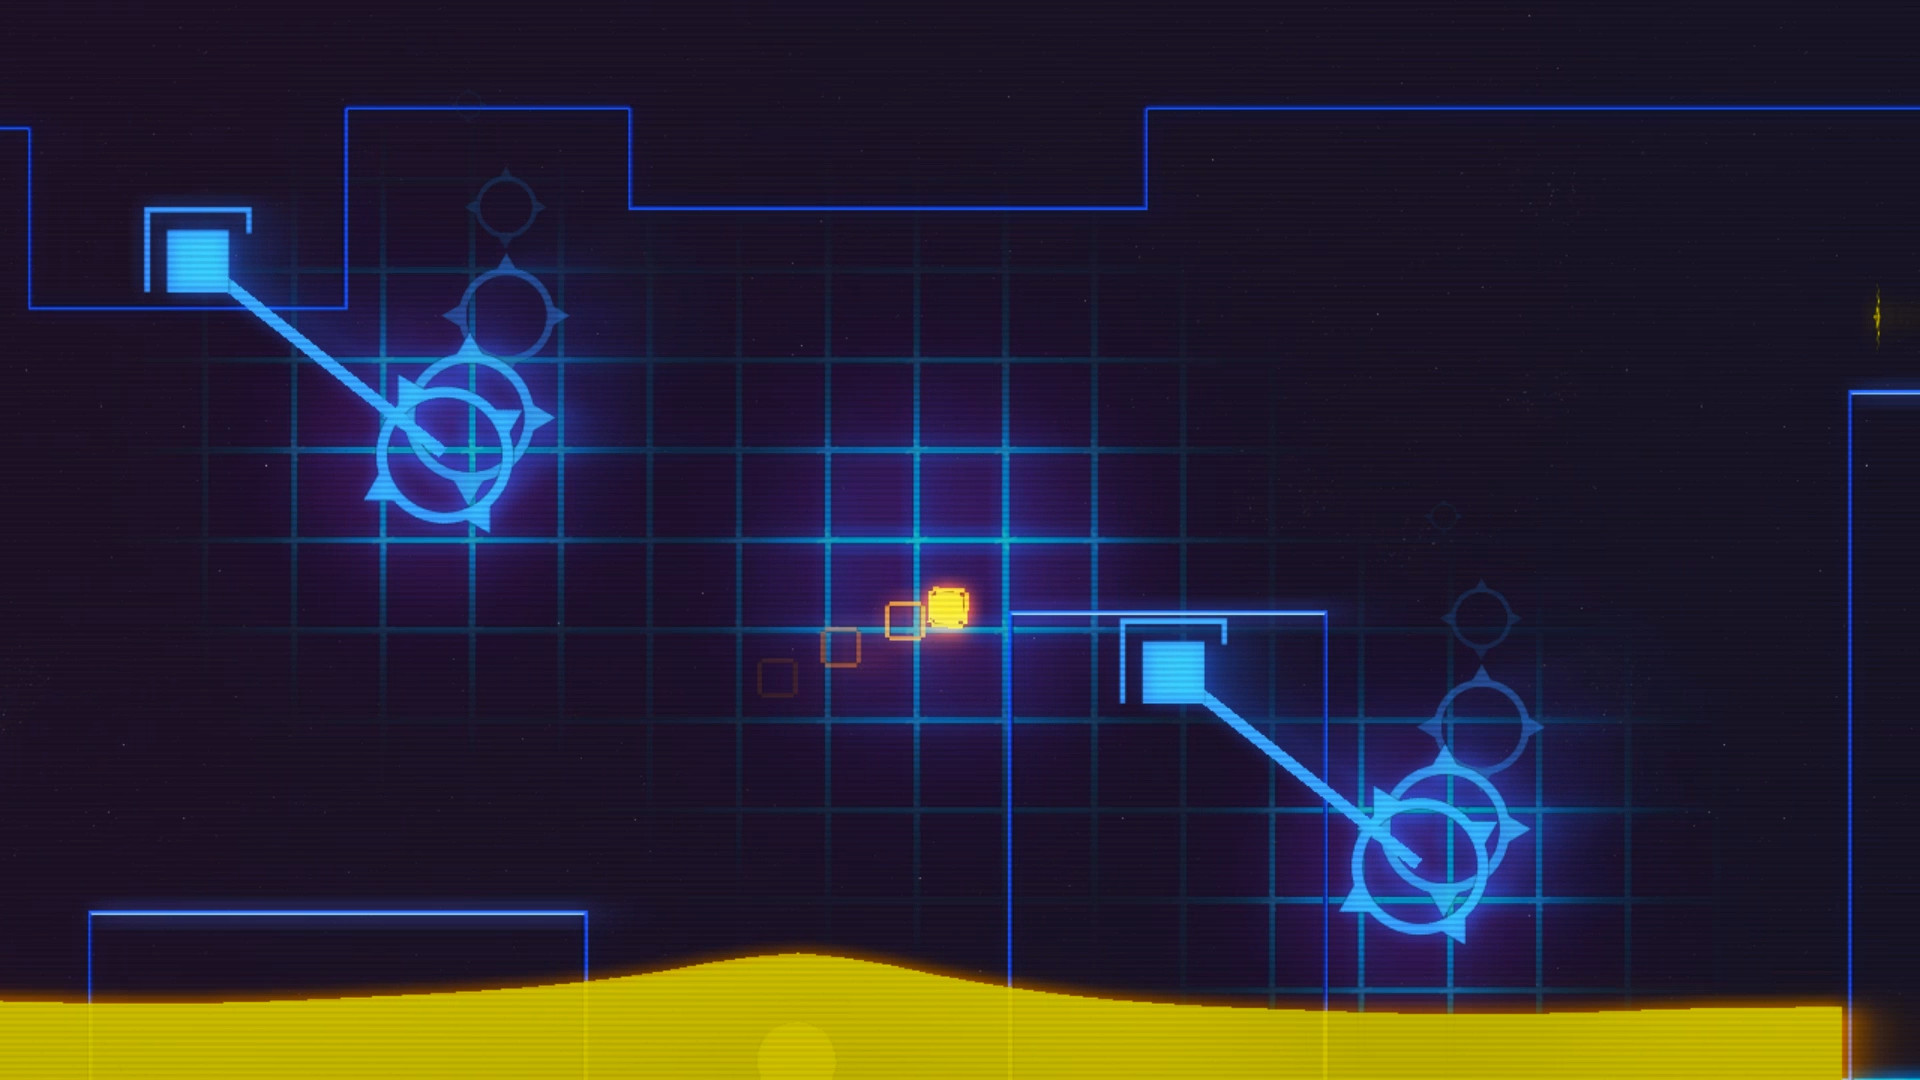 flatland prologue game desktop wallpaper 73526